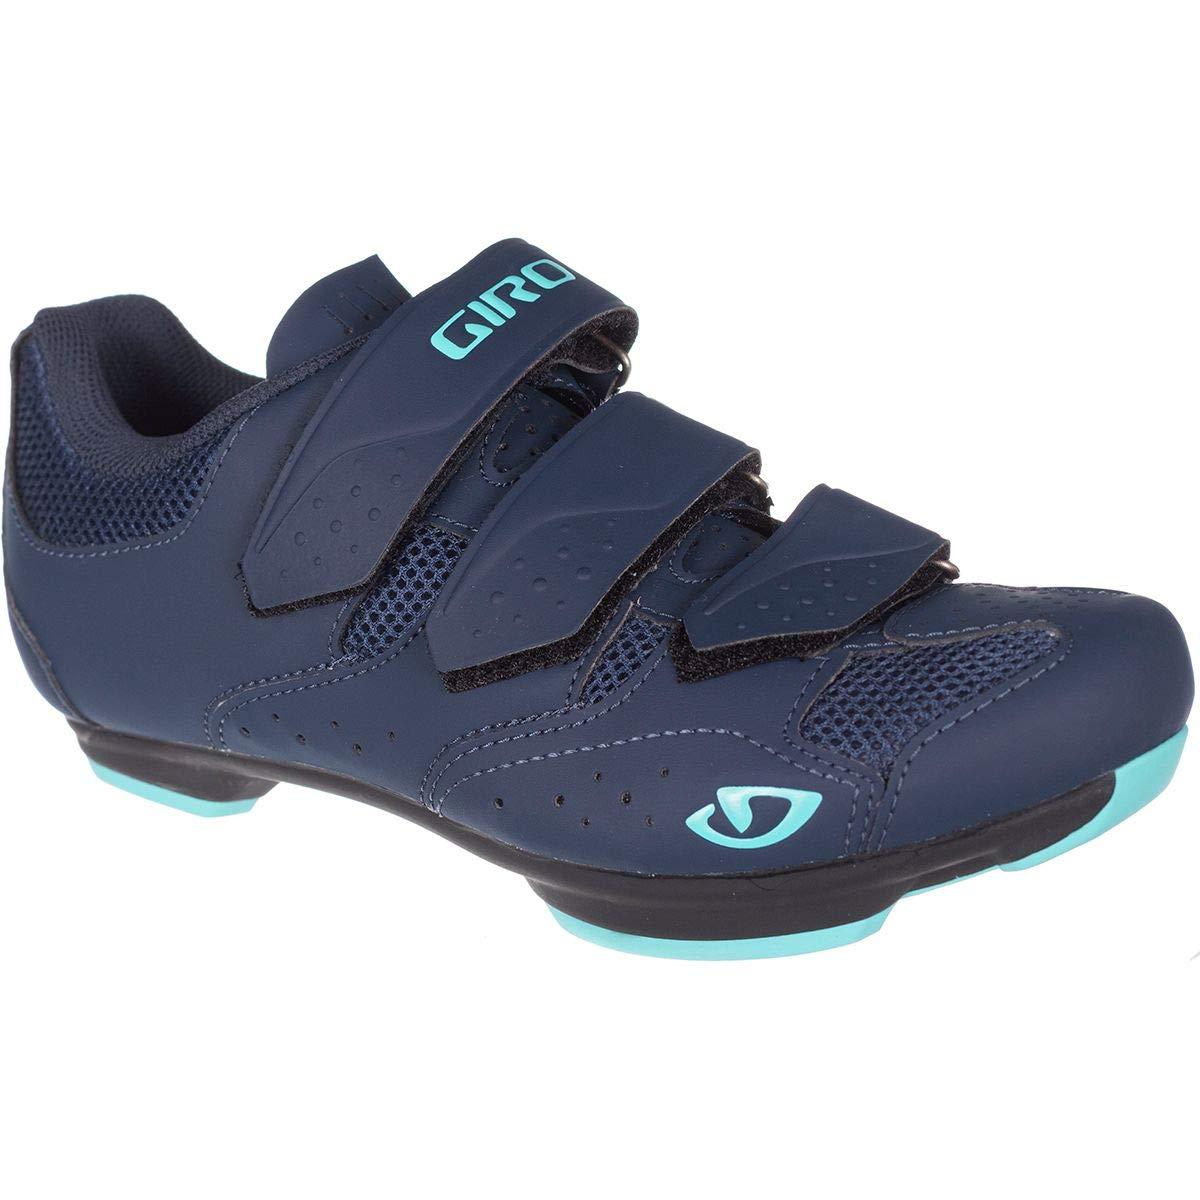 sale retailer 794cf e0939 Giro Rev Shoes Women Midnight/Iceberg 2019 Bike Shoes ...